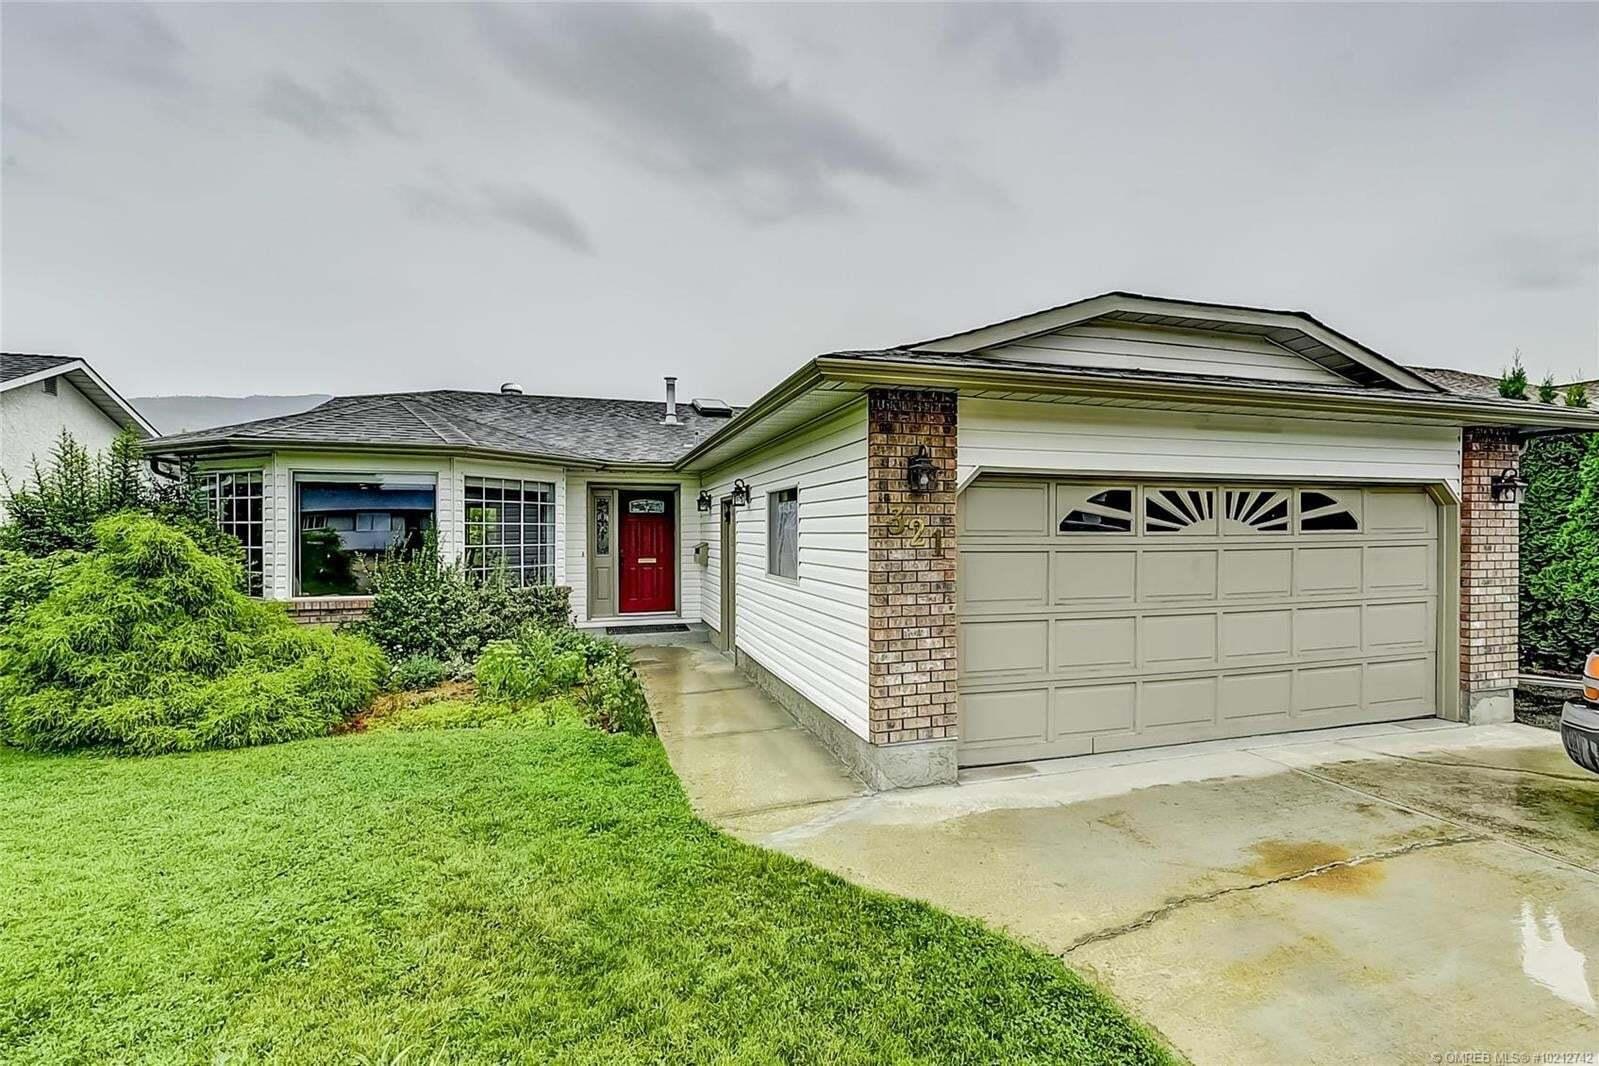 House for sale at 321 Molnar Rd Kelowna British Columbia - MLS: 10212742